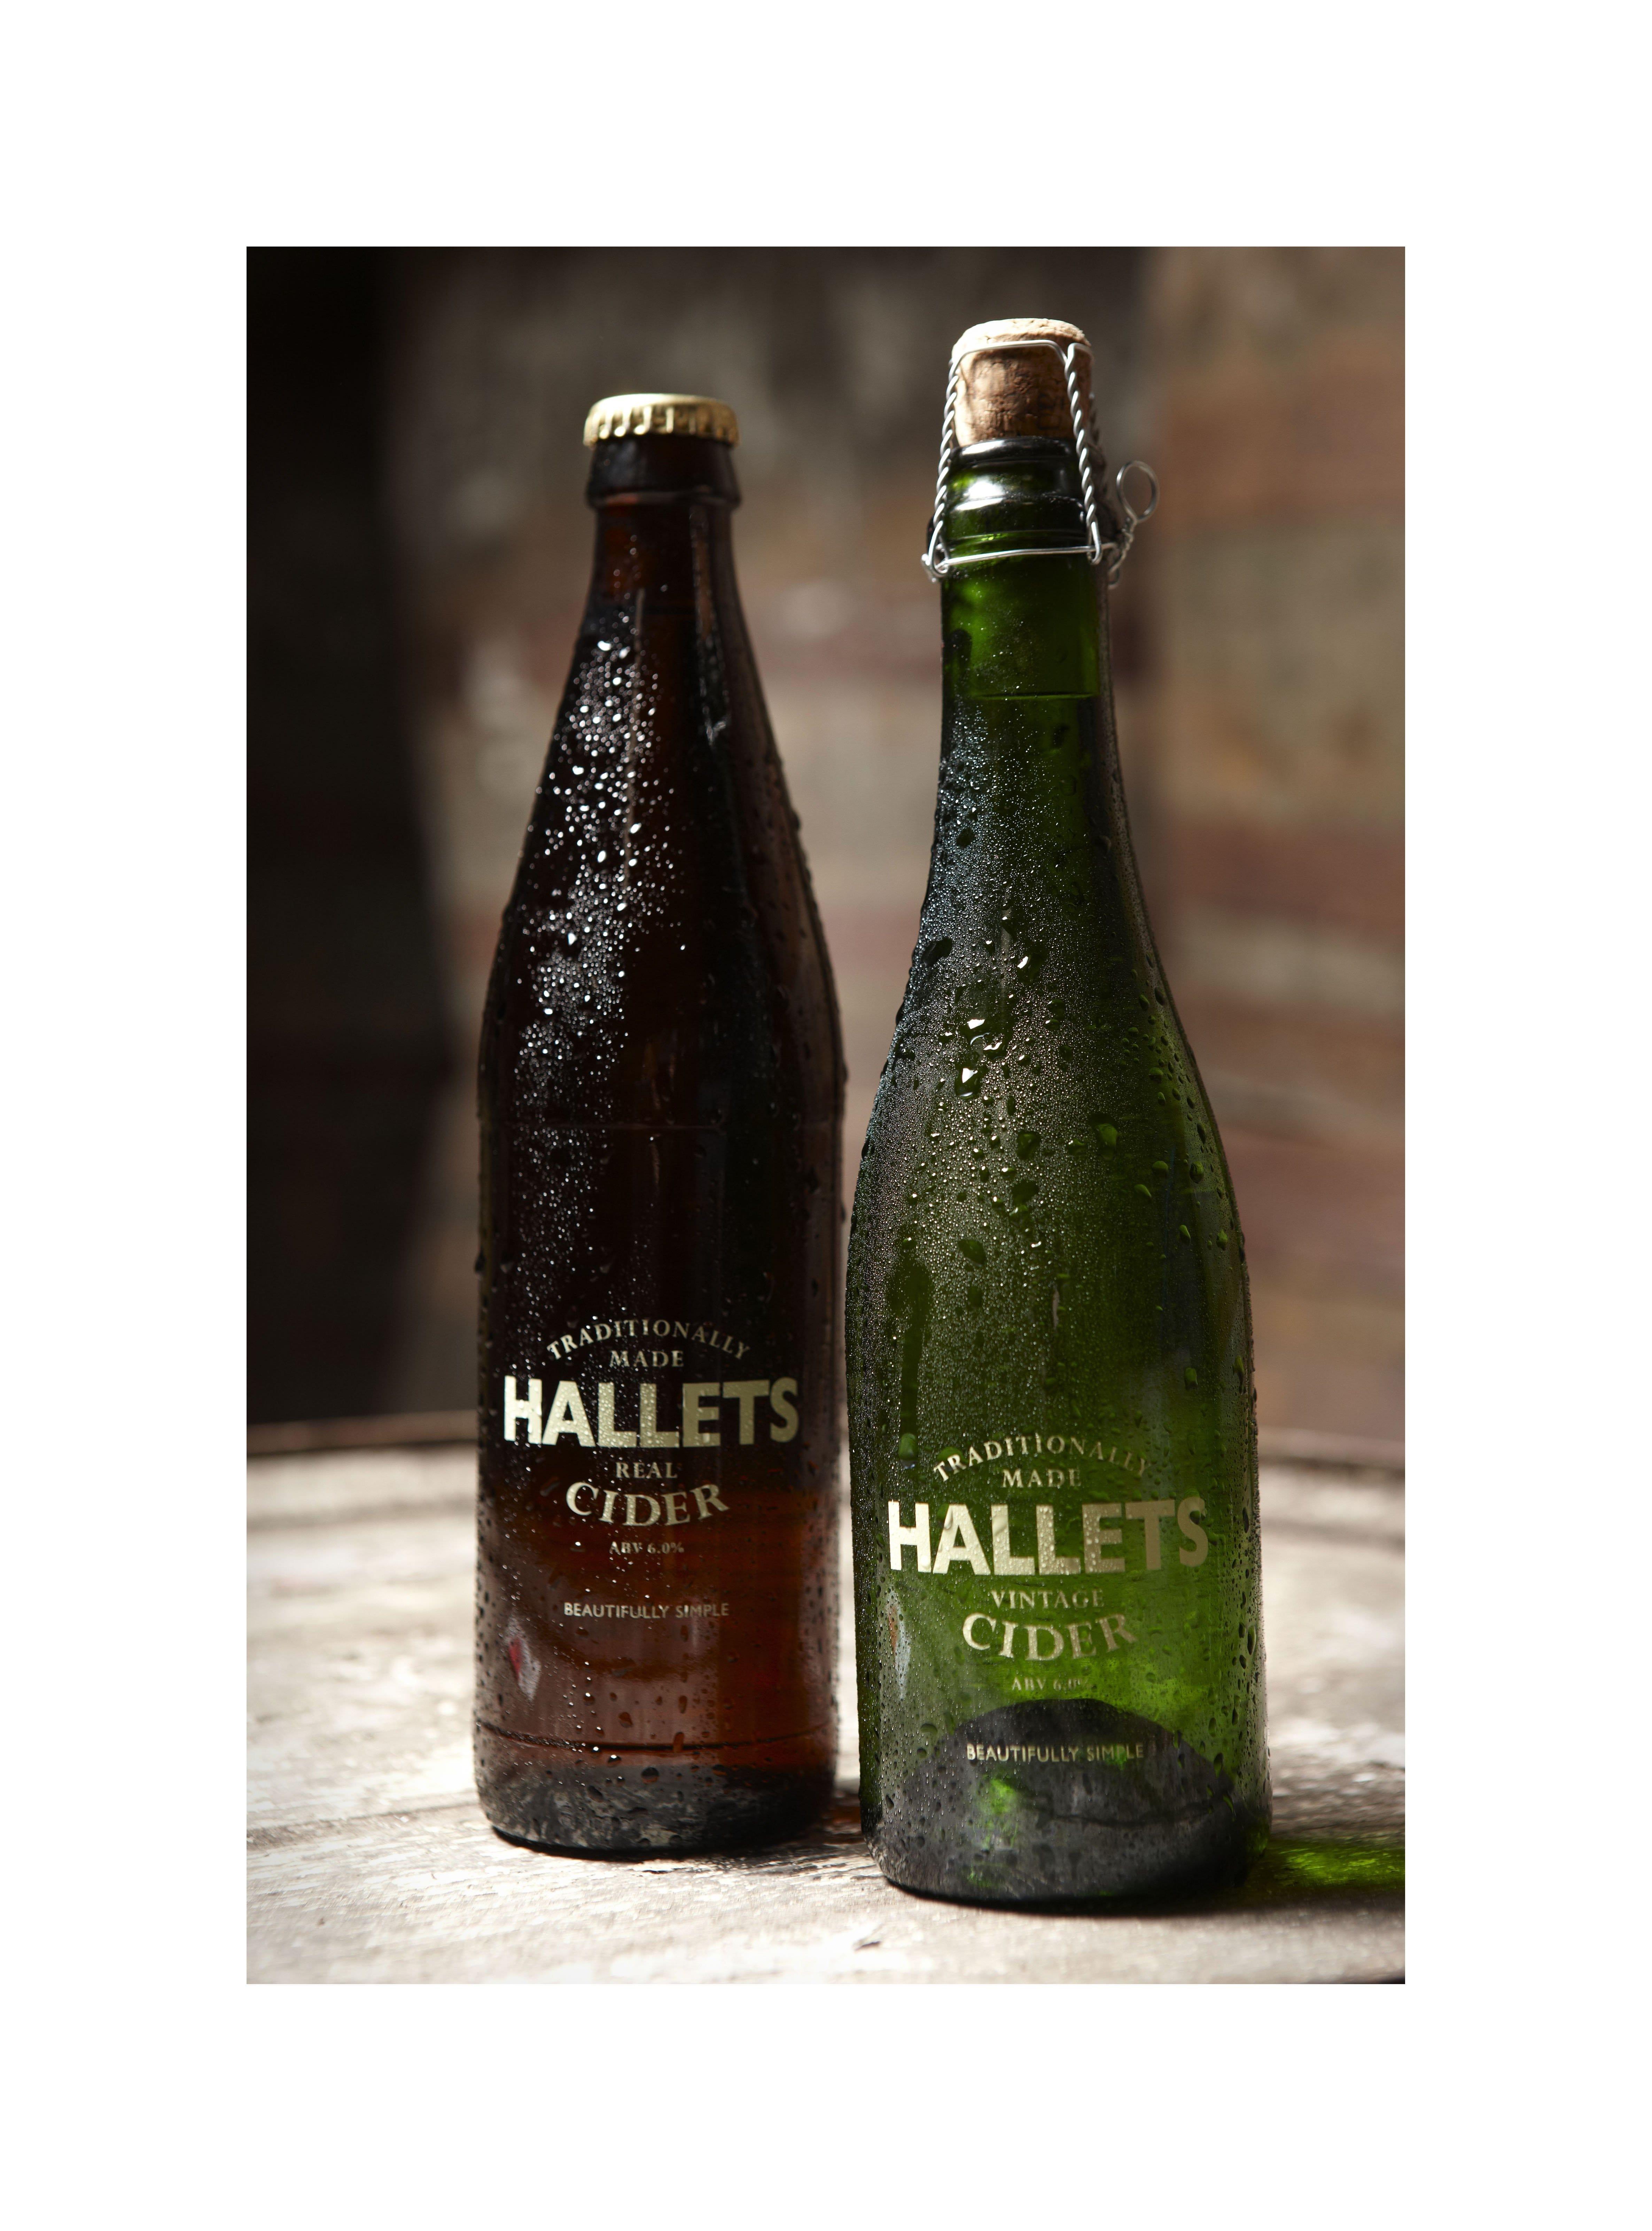 Hallets Cider - Blaengawney Farm